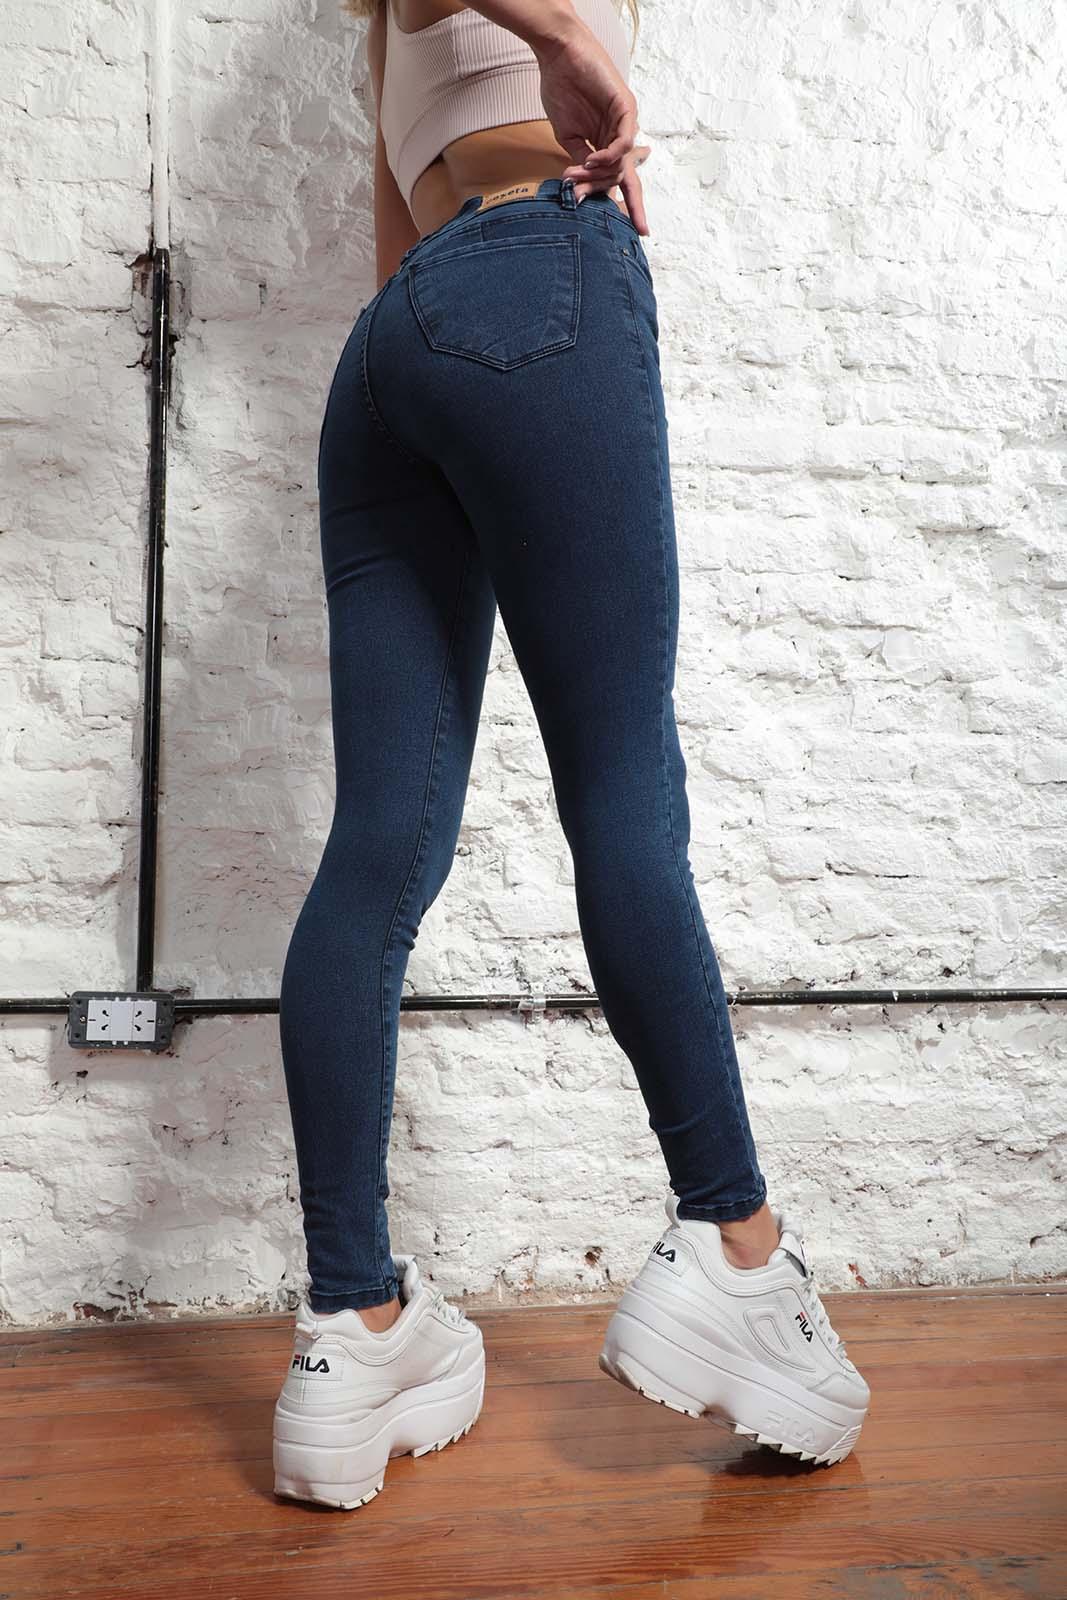 Cezeta Jeans Chupin azul